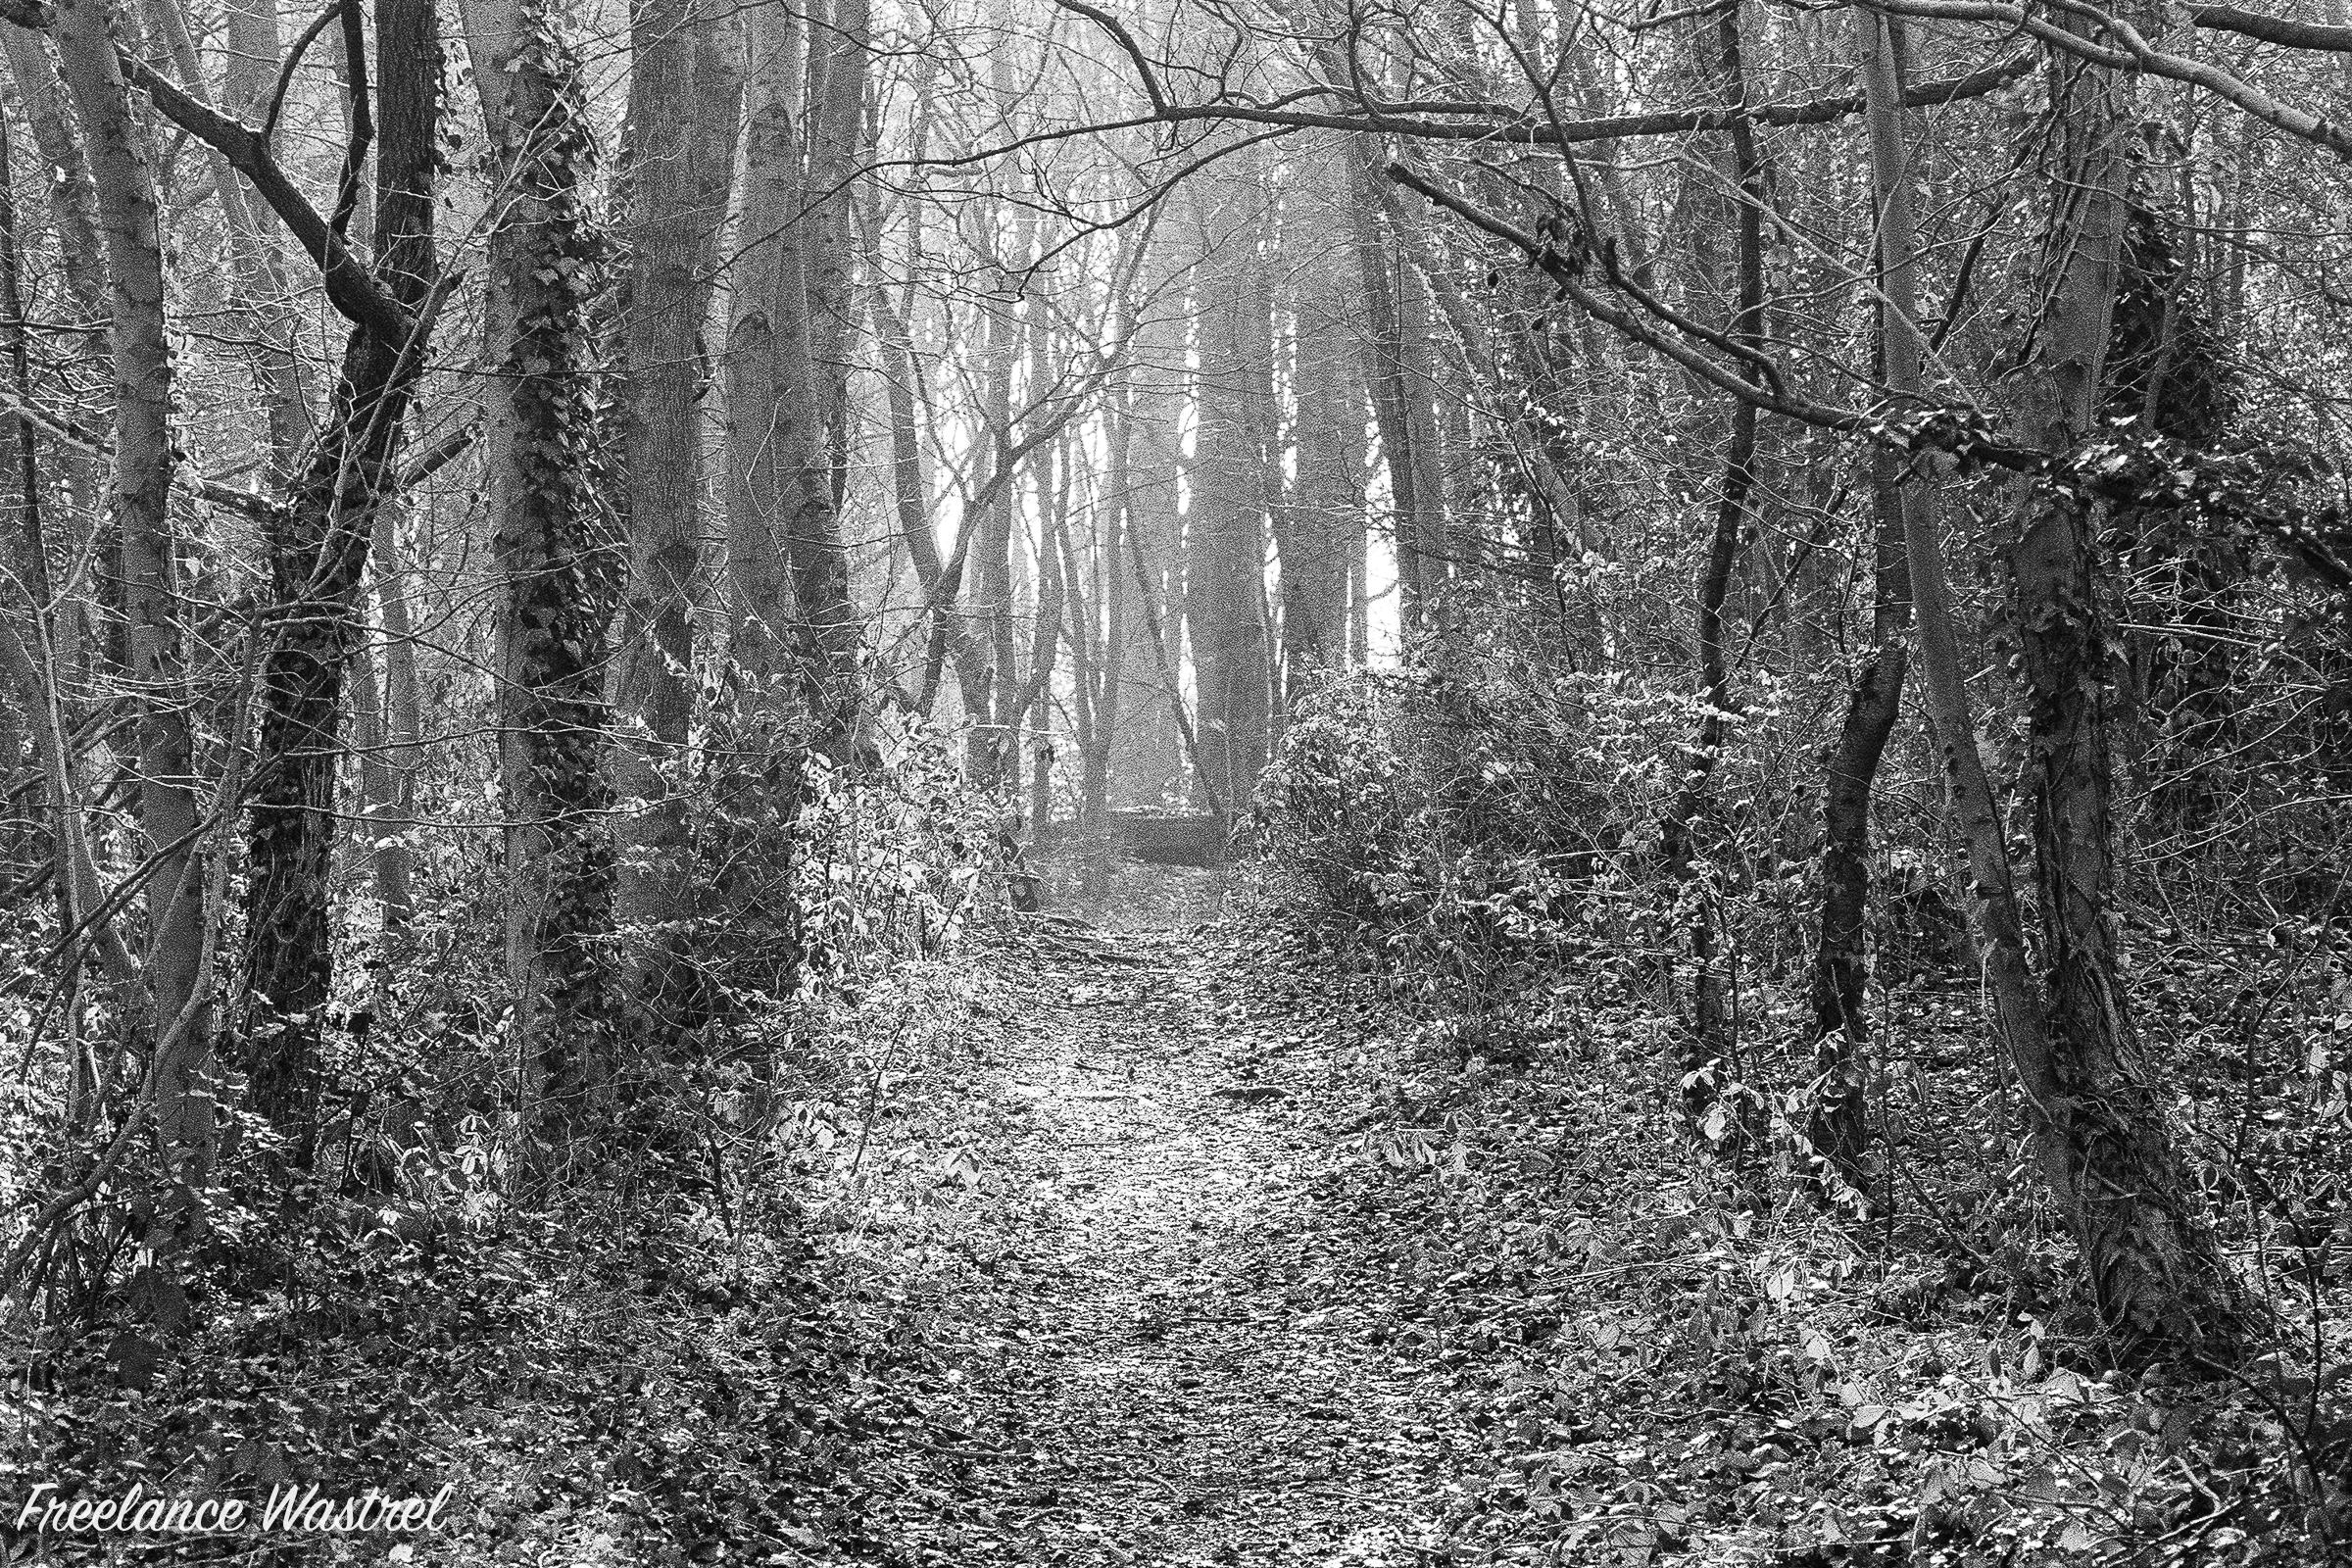 Woodland path, February 2019